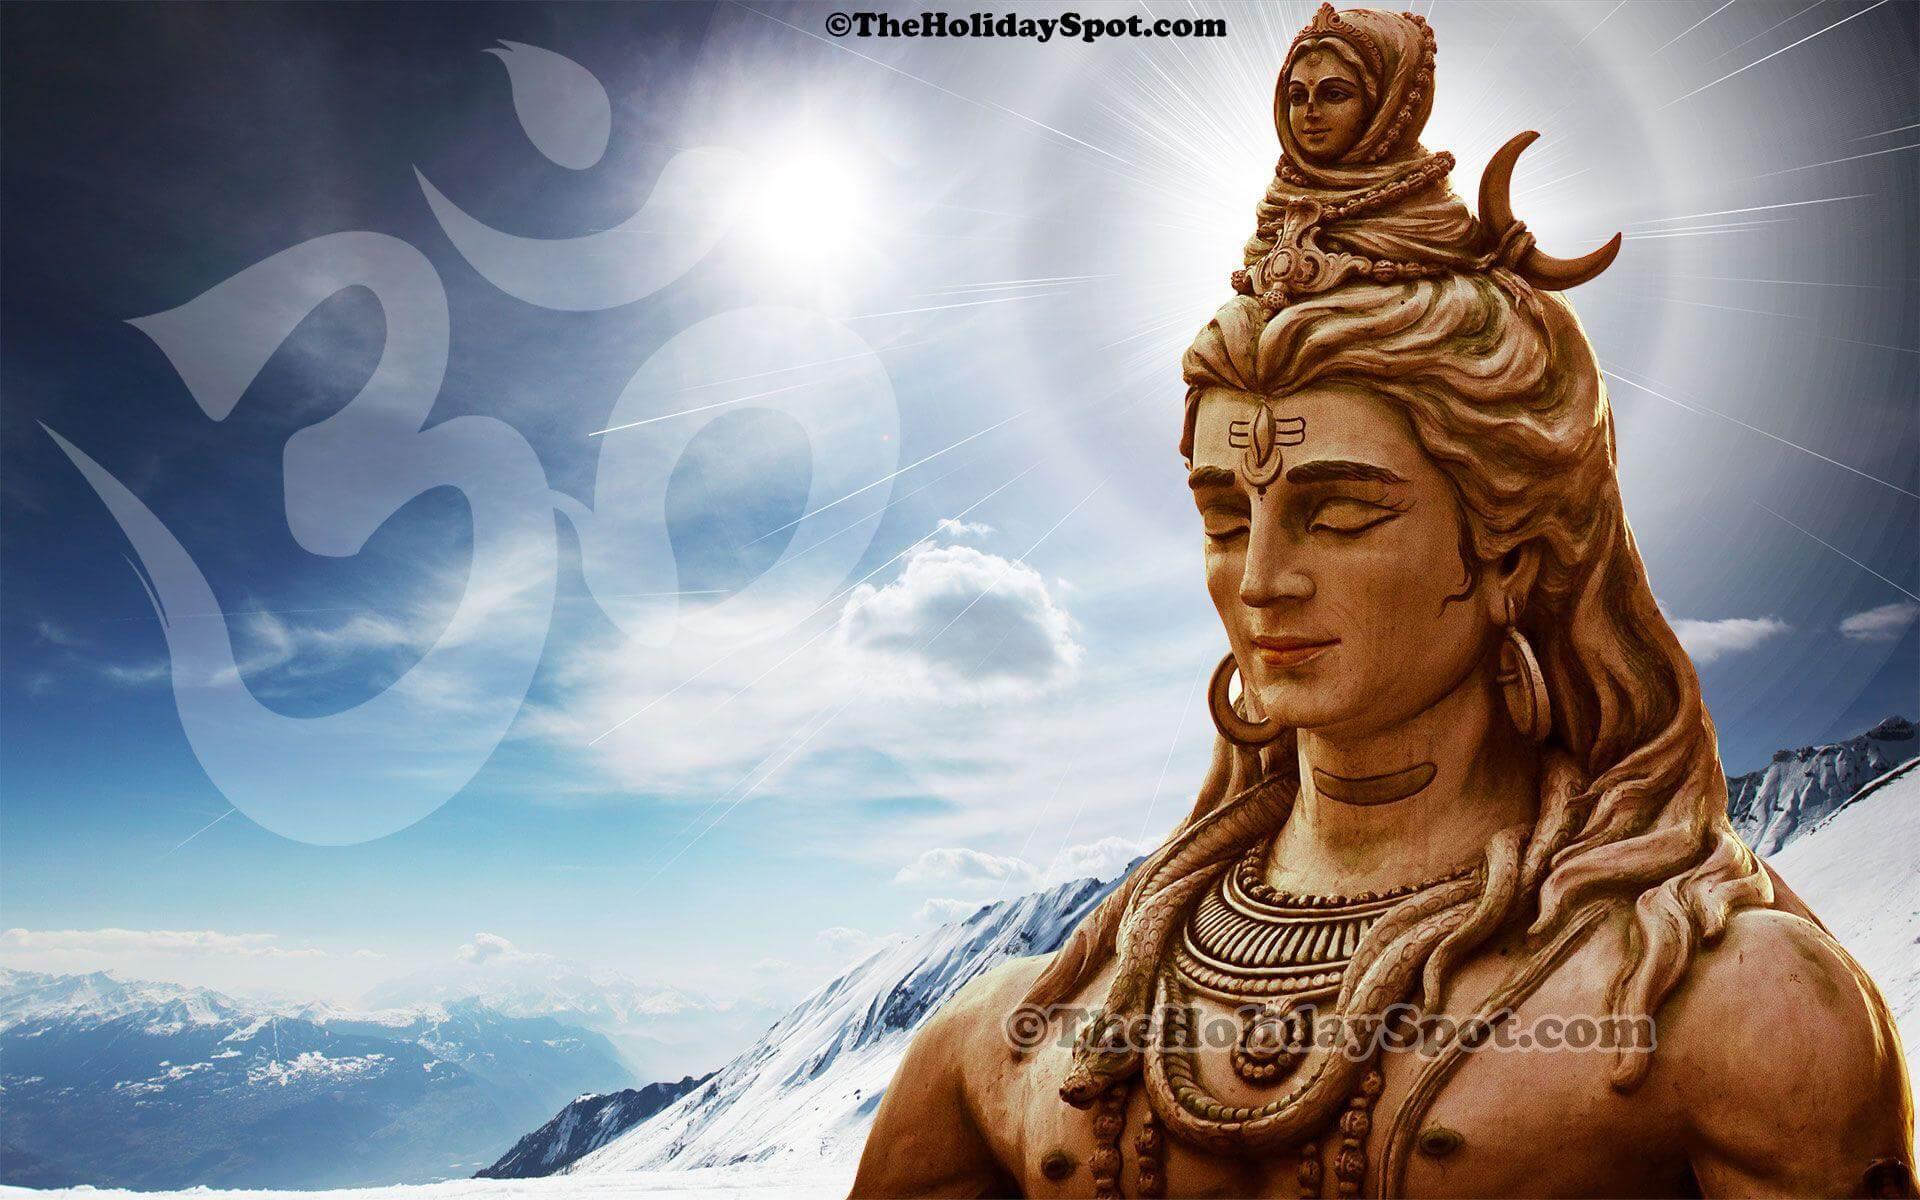 Kada Nilimpanirjhari Nikujnjakotare Vasanh रावण रचित शिव तांडव स्तोत्र बोल और अर्थ Shiv Tandav Lyrics And Meaning Made By Ravan (20)